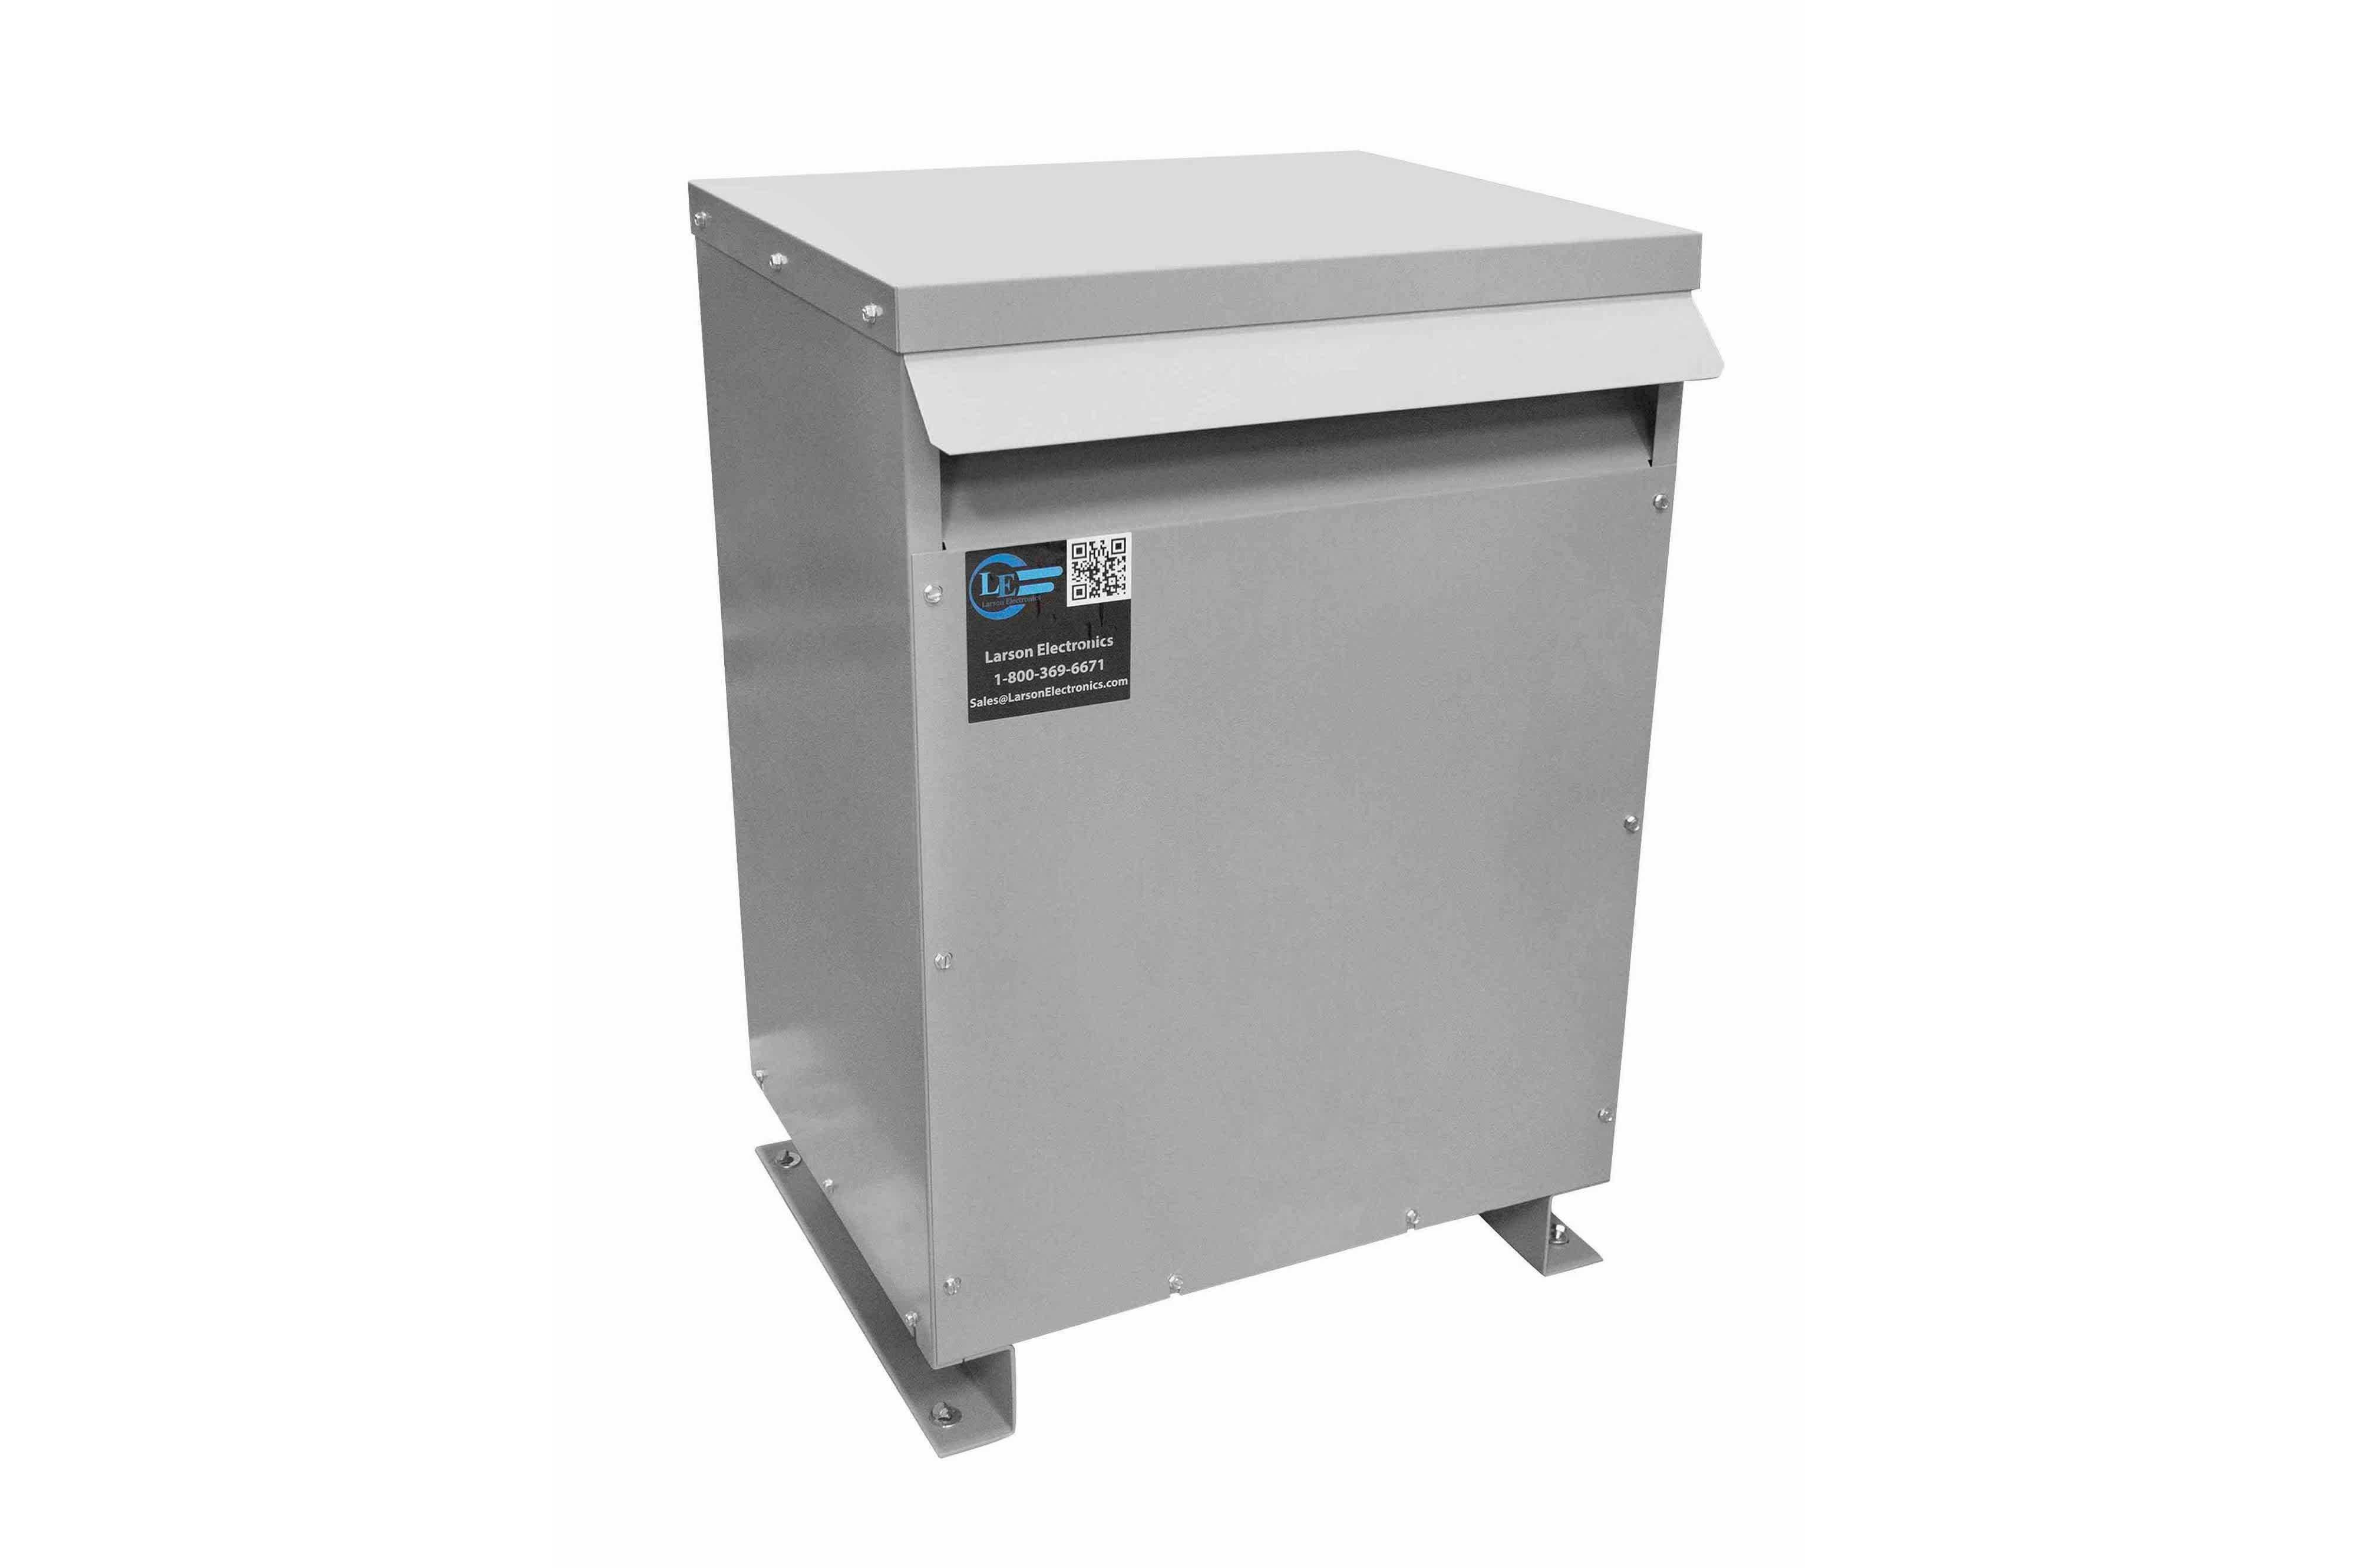 500 kVA 3PH DOE Transformer, 575V Delta Primary, 380Y/220 Wye-N Secondary, N3R, Ventilated, 60 Hz